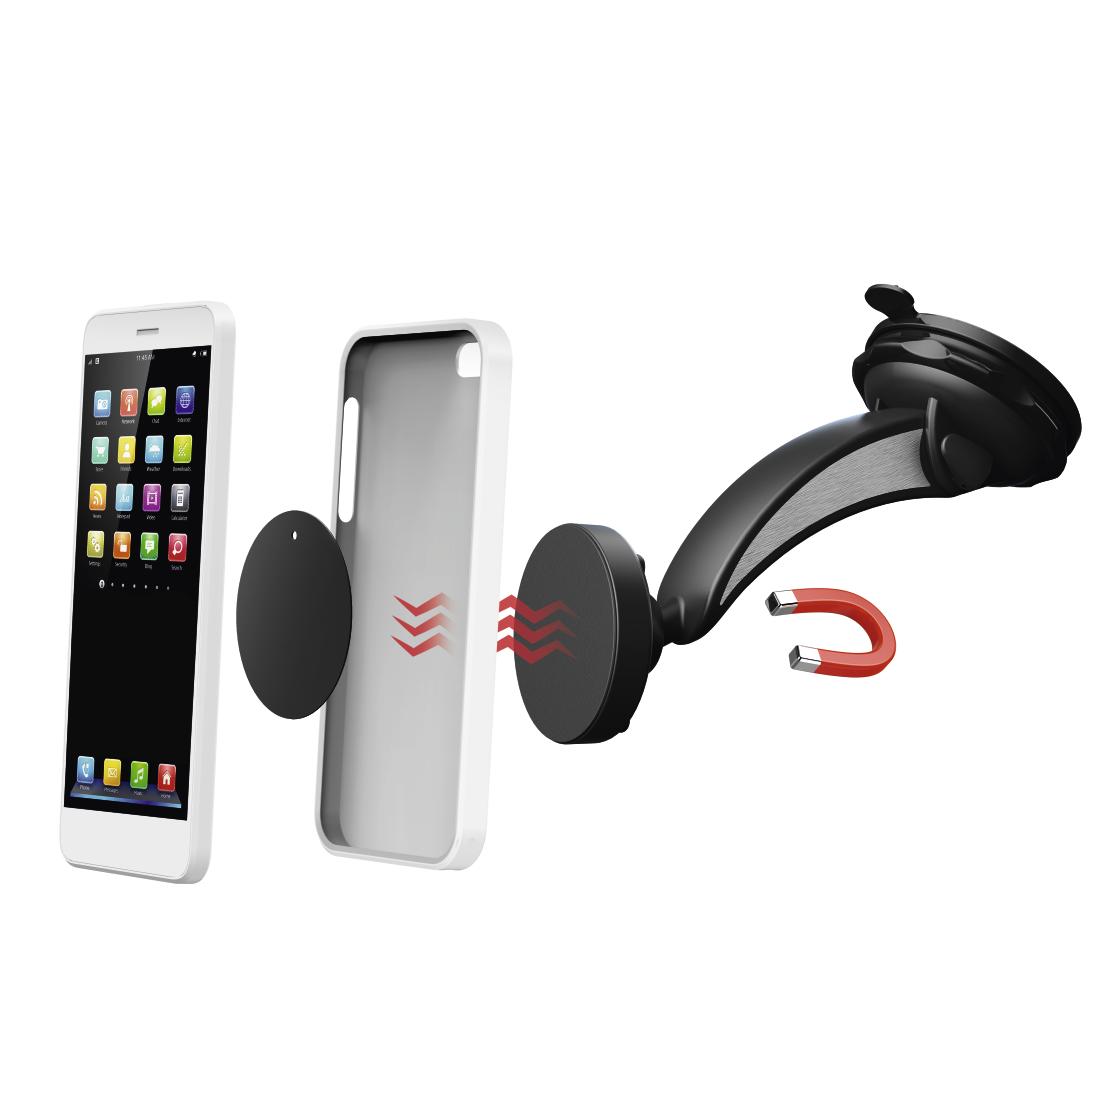 00178245 hama uni smartphone halter magnet mit saugnapf hama de. Black Bedroom Furniture Sets. Home Design Ideas